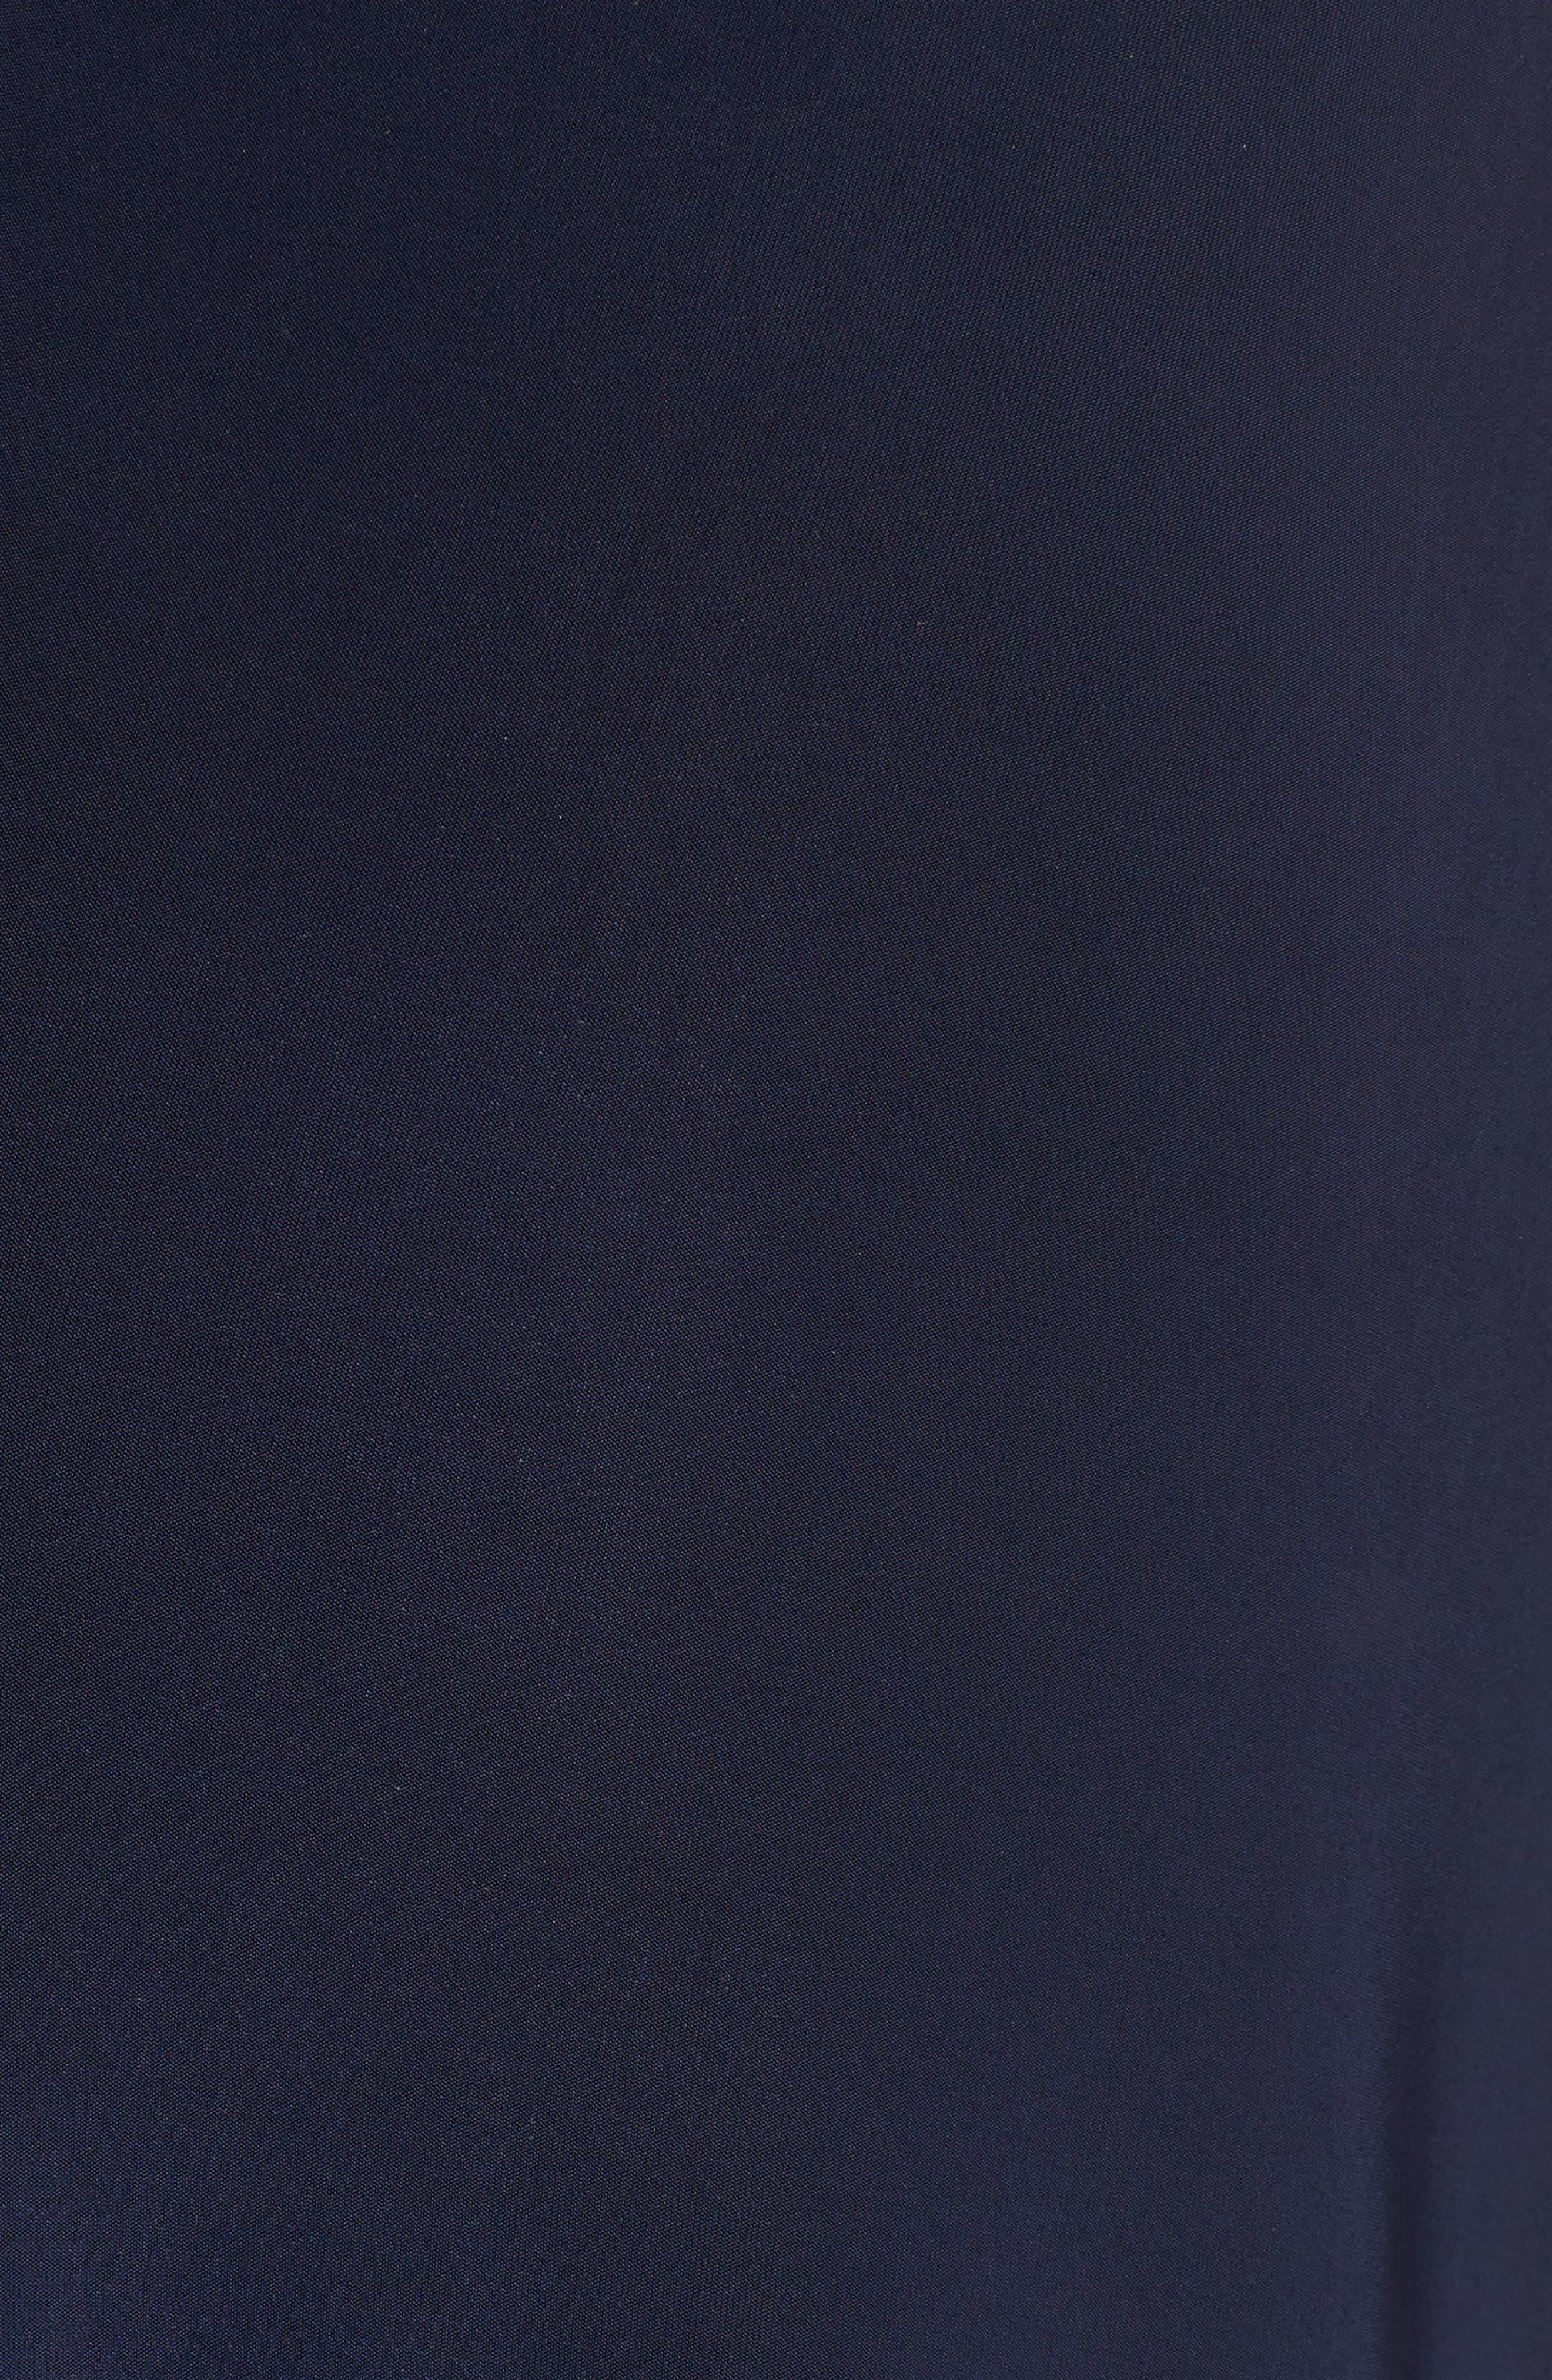 Domino Knot Maxi Dress,                             Alternate thumbnail 6, color,                             MIDNIGHT